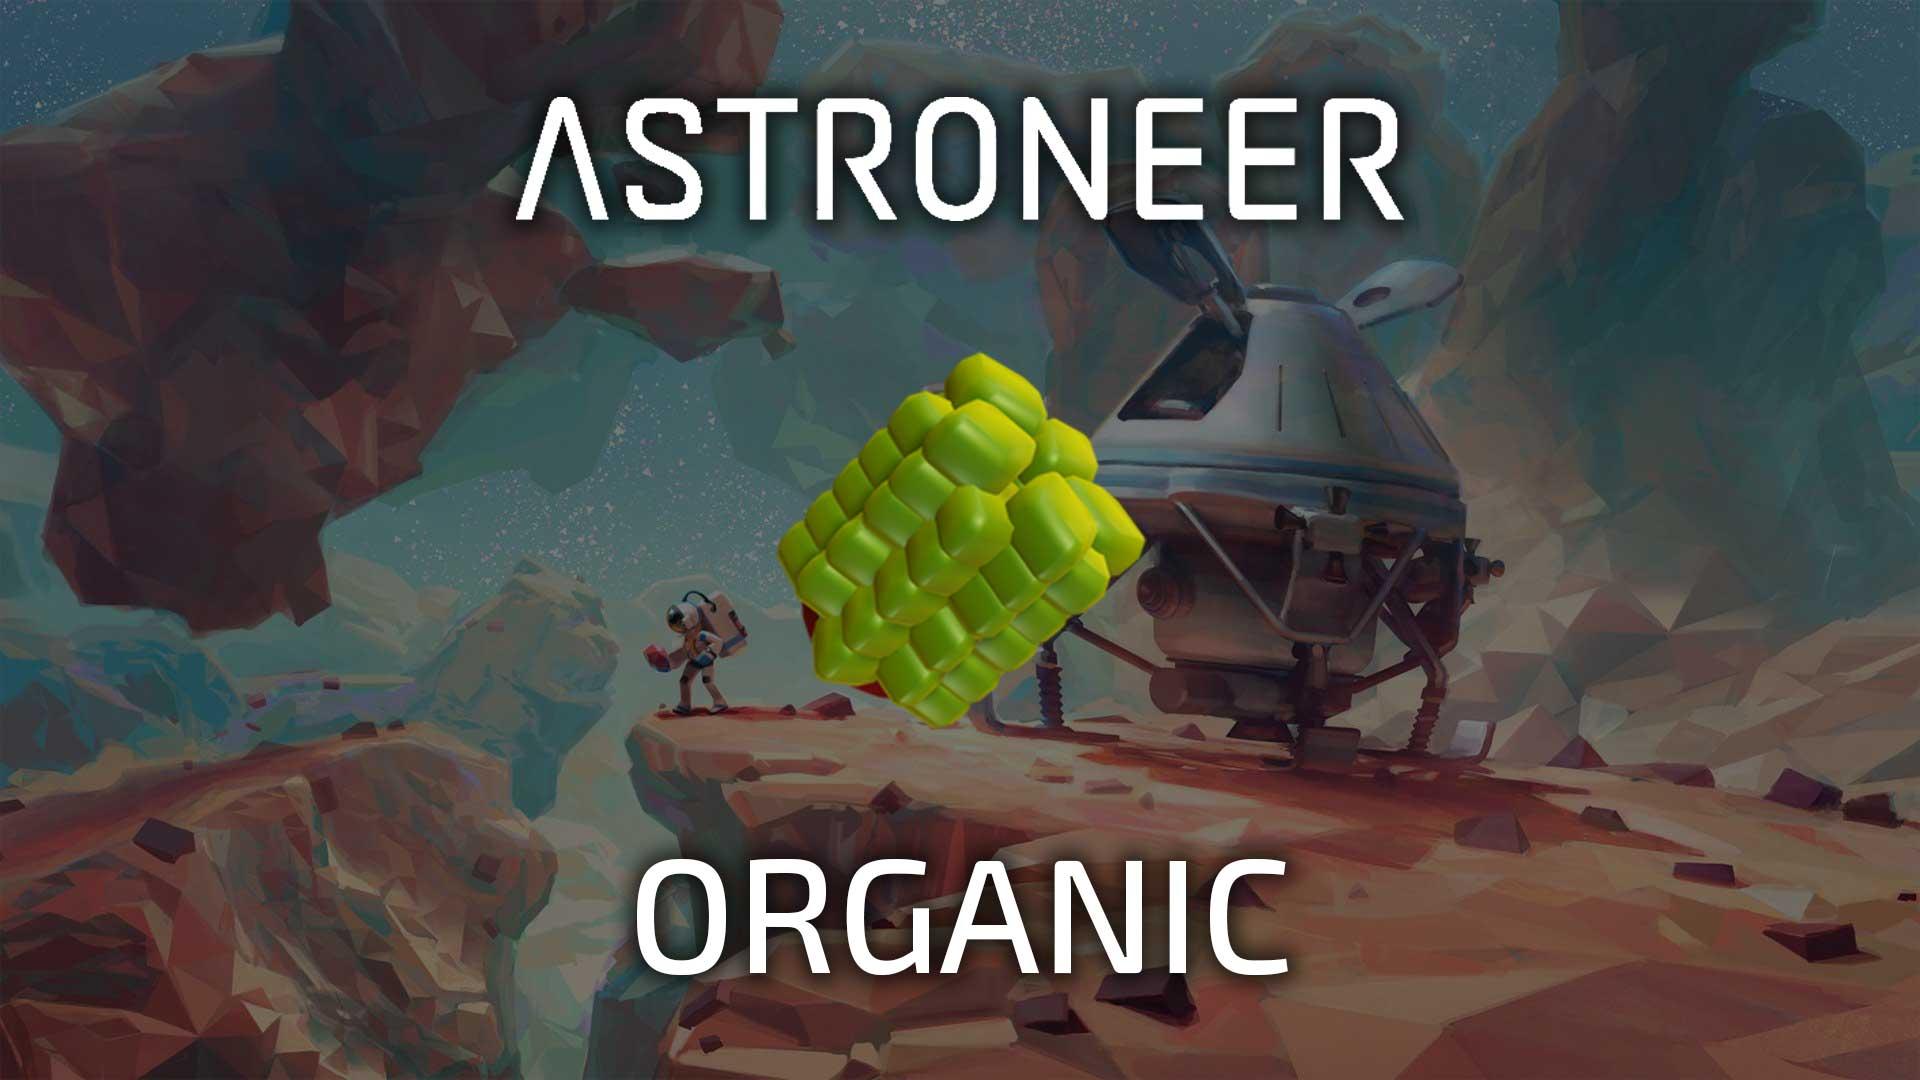 Astroneer Organic